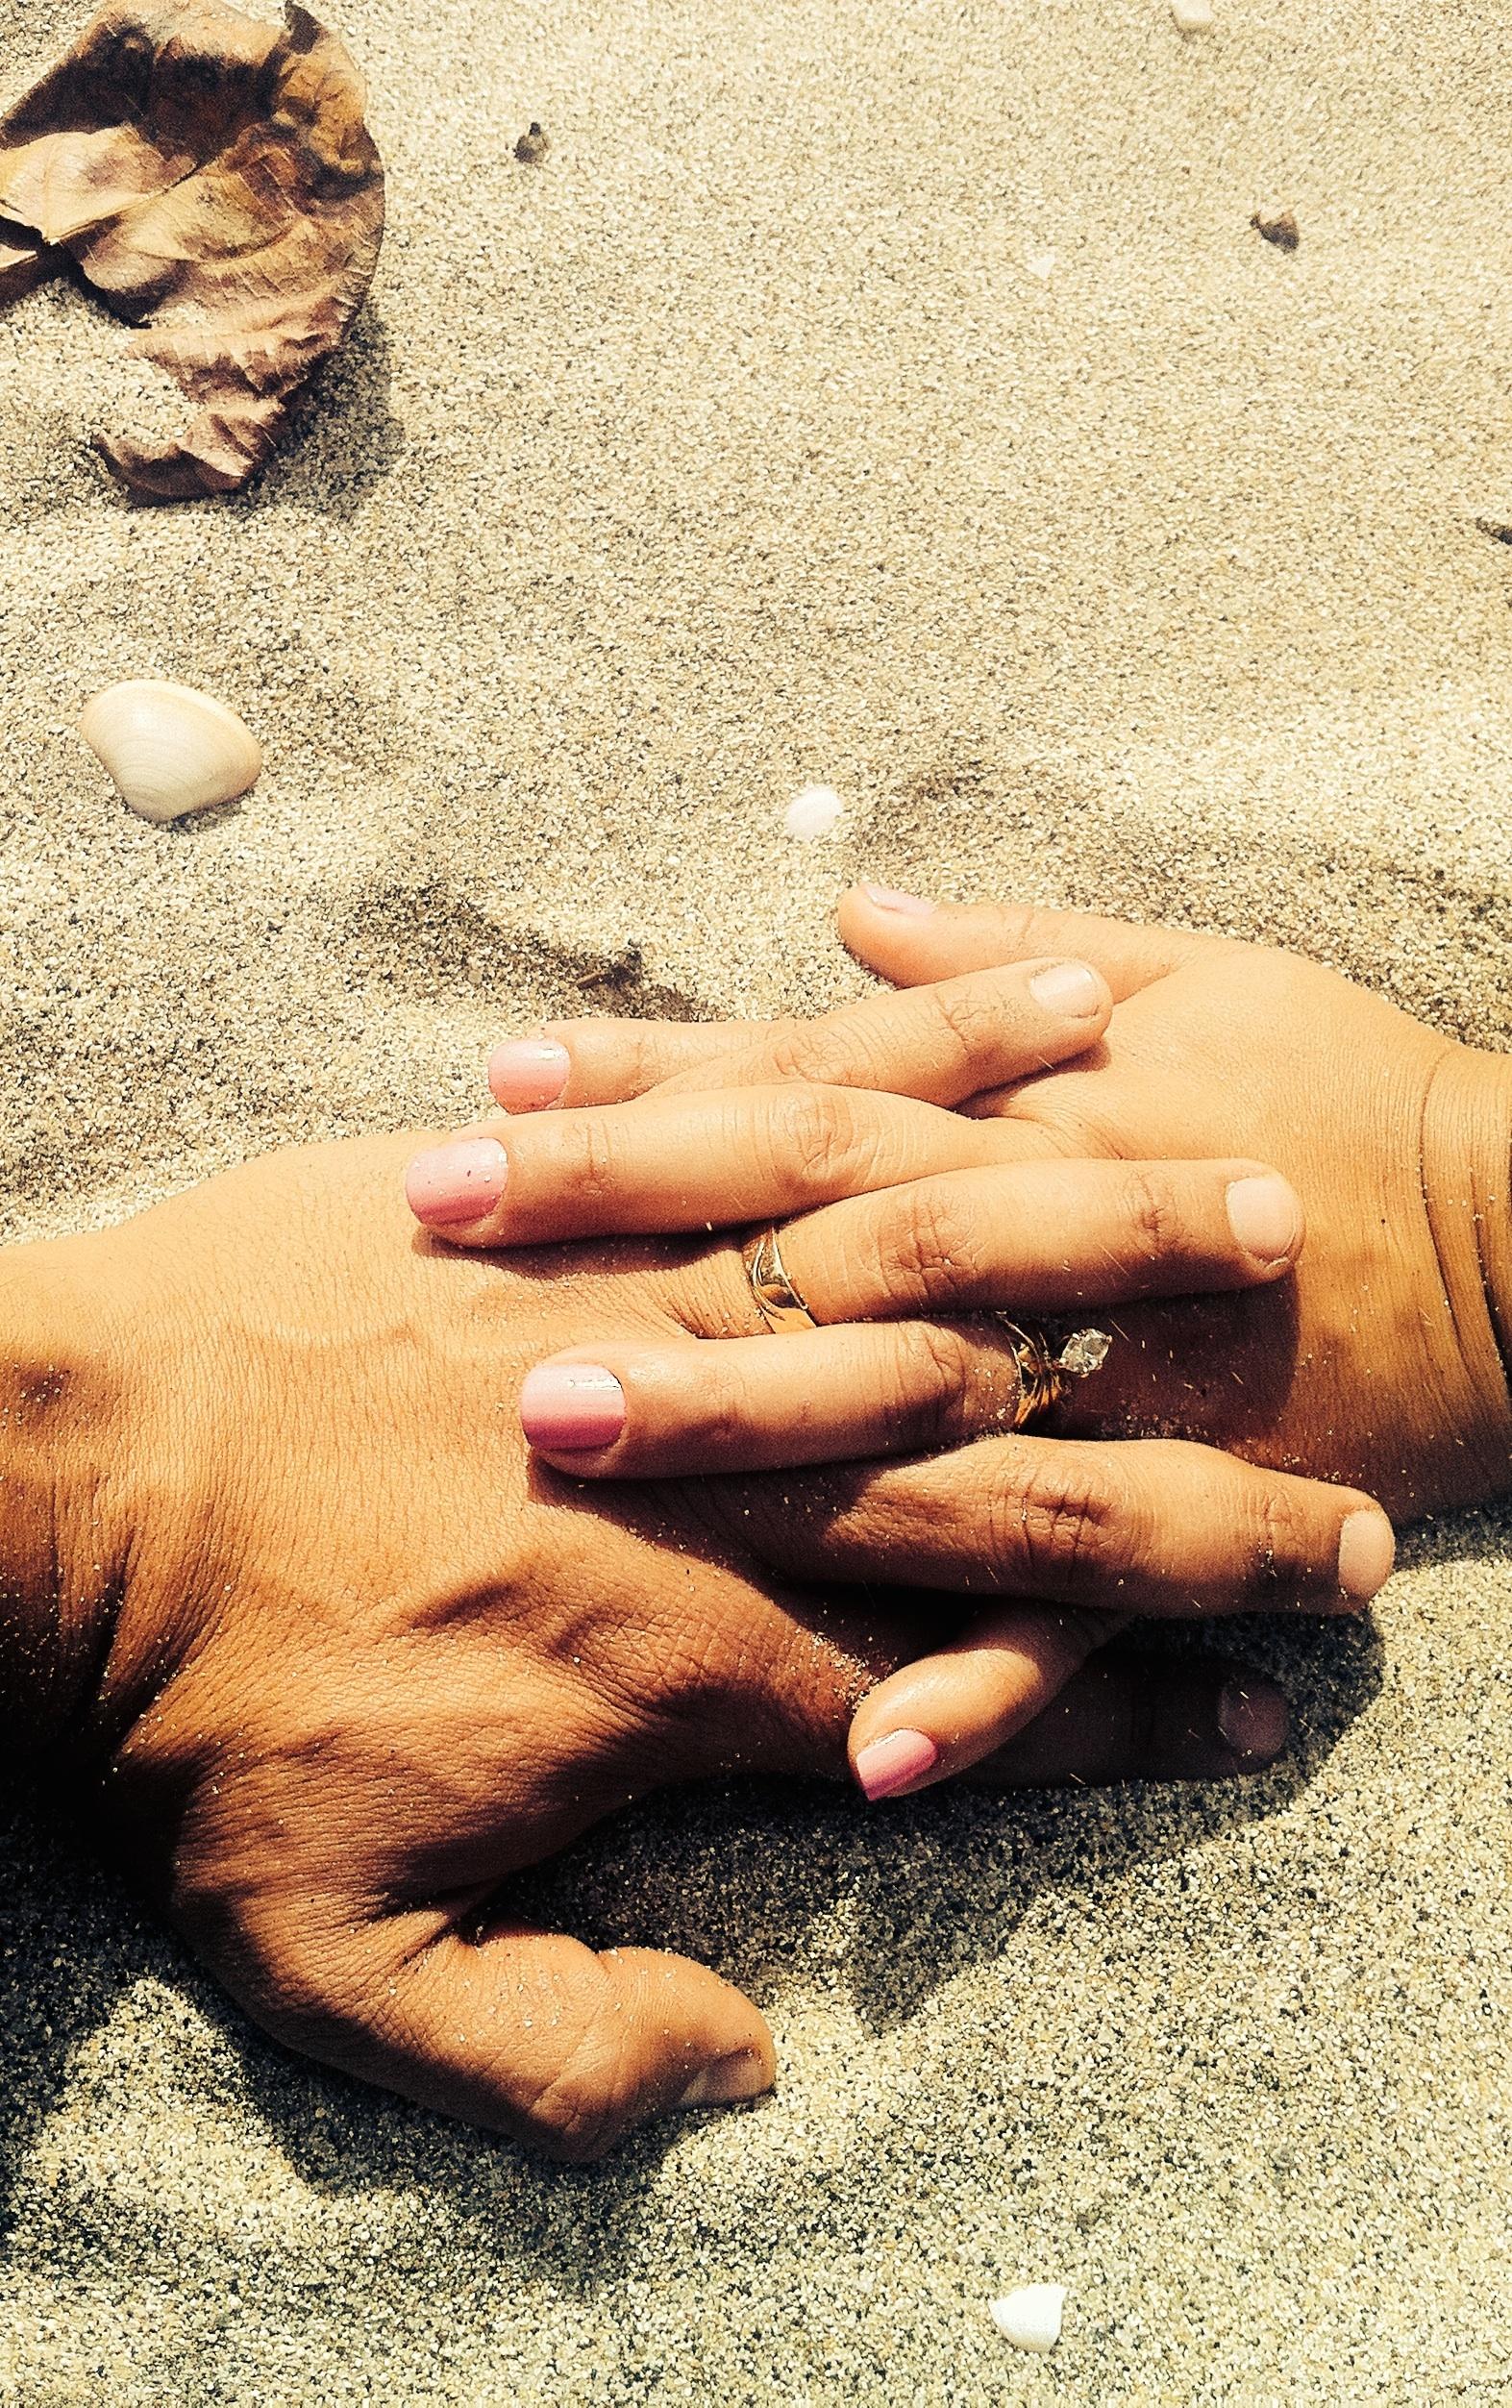 Couple, Hand, Hold, Husband, Love, HQ Photo